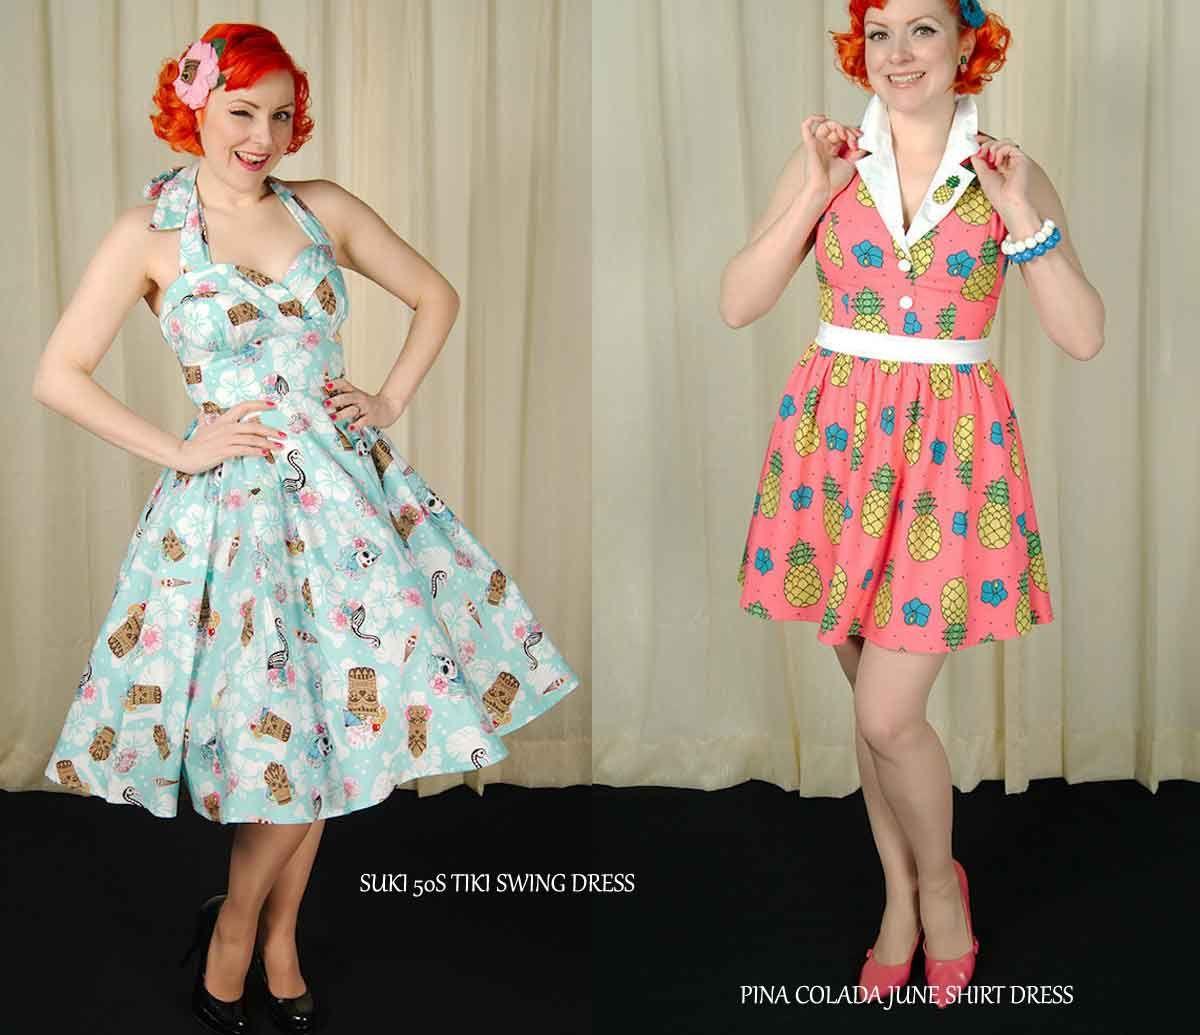 443ea36b786 Honolulu Baby  Tiki Dresses from Cats Like Us  glamourdaze  blog  feature   pinup  tiki  retro  catslikeus